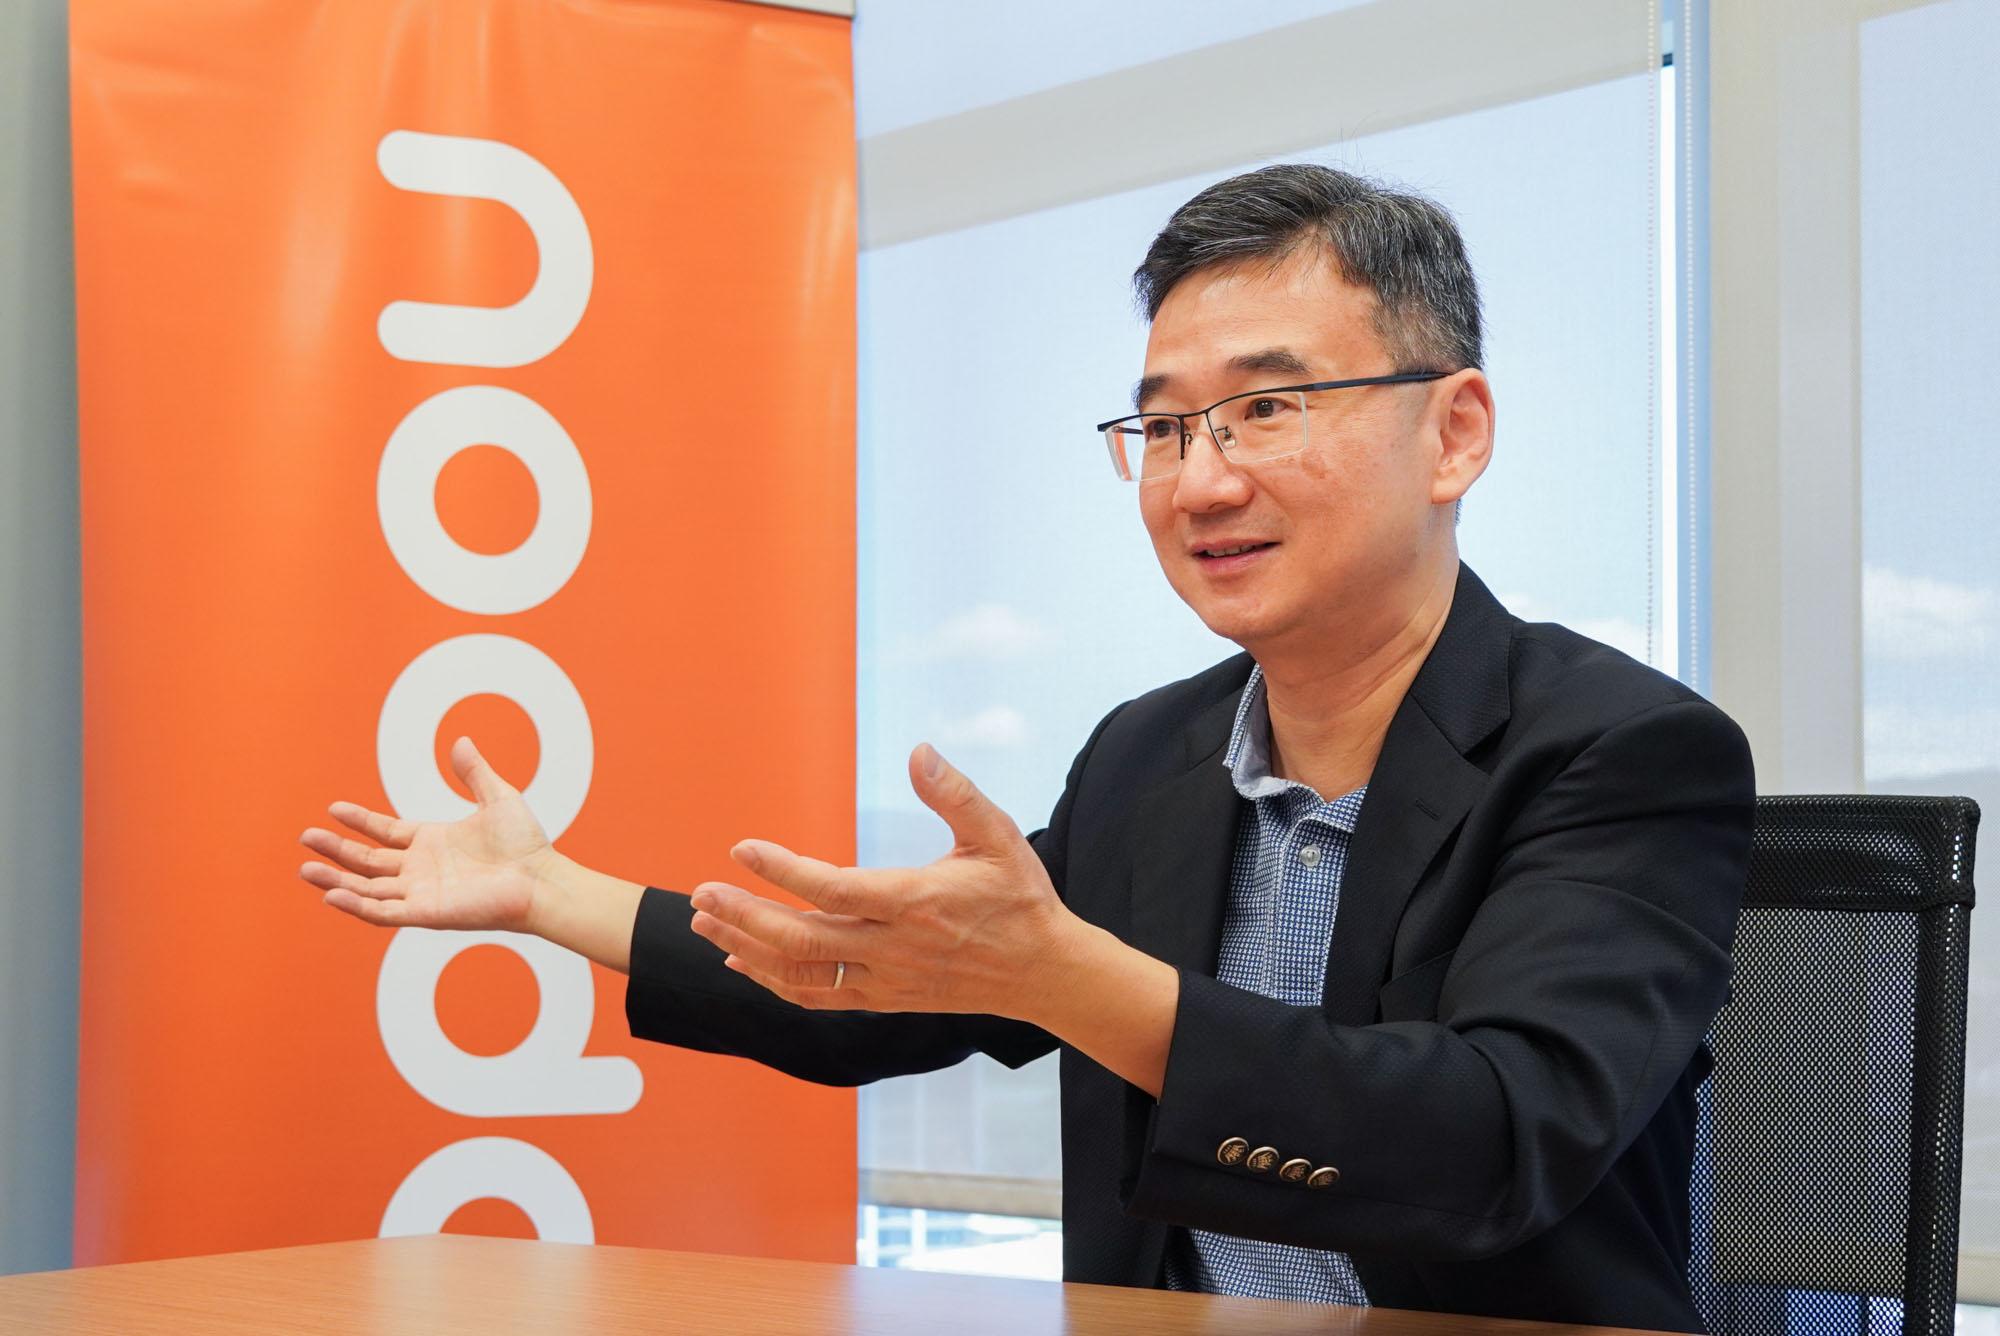 Noodoe 創辦人王景弘董事長接受【2GameSome - 有車賞】的專訪。